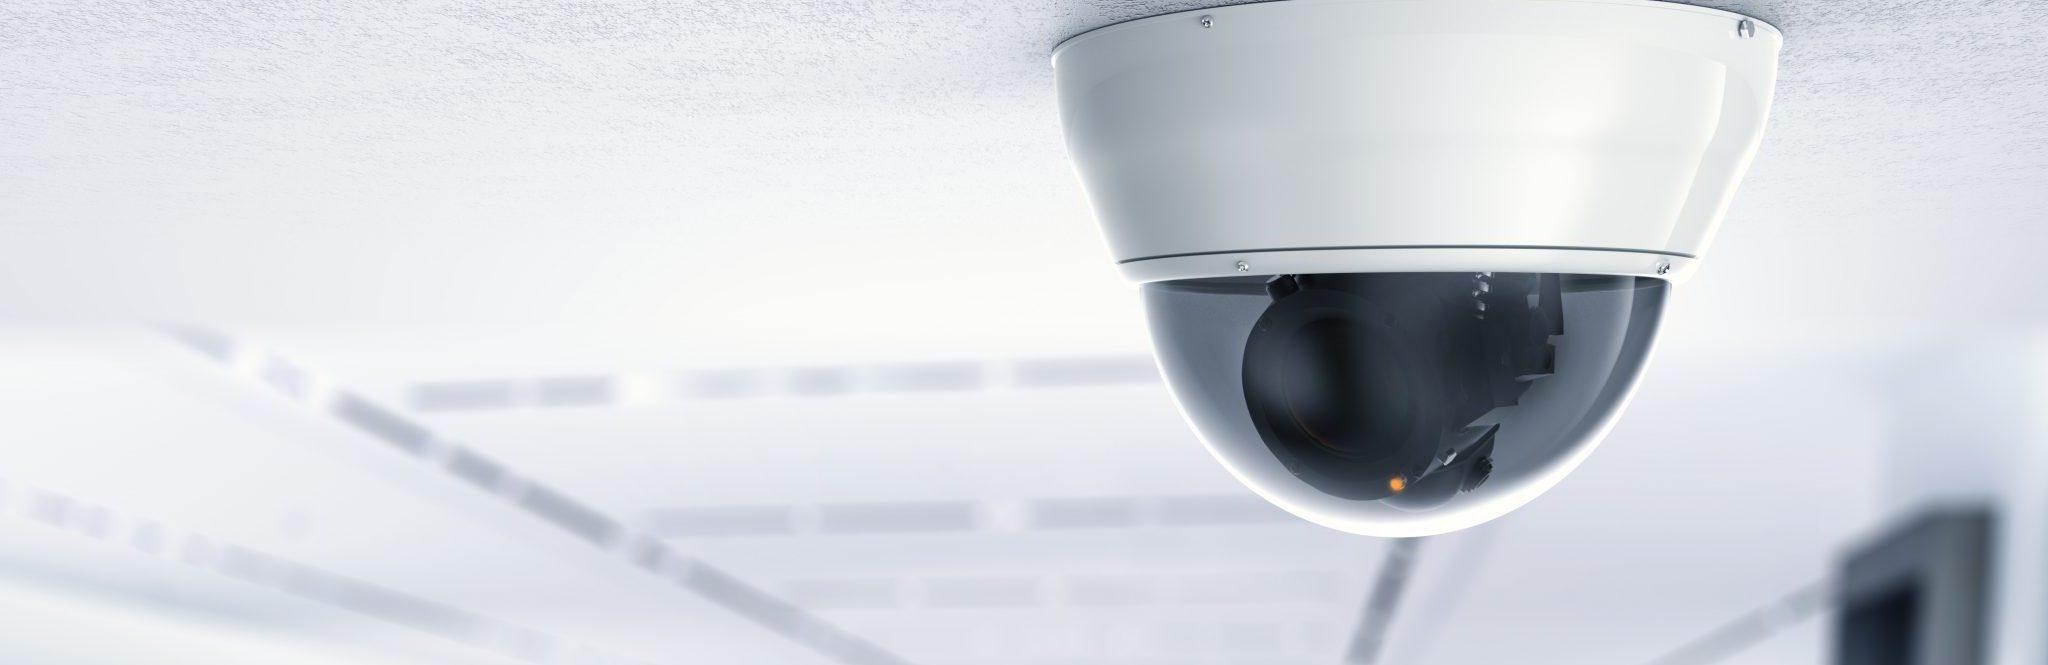 CCTV-Company-Connection